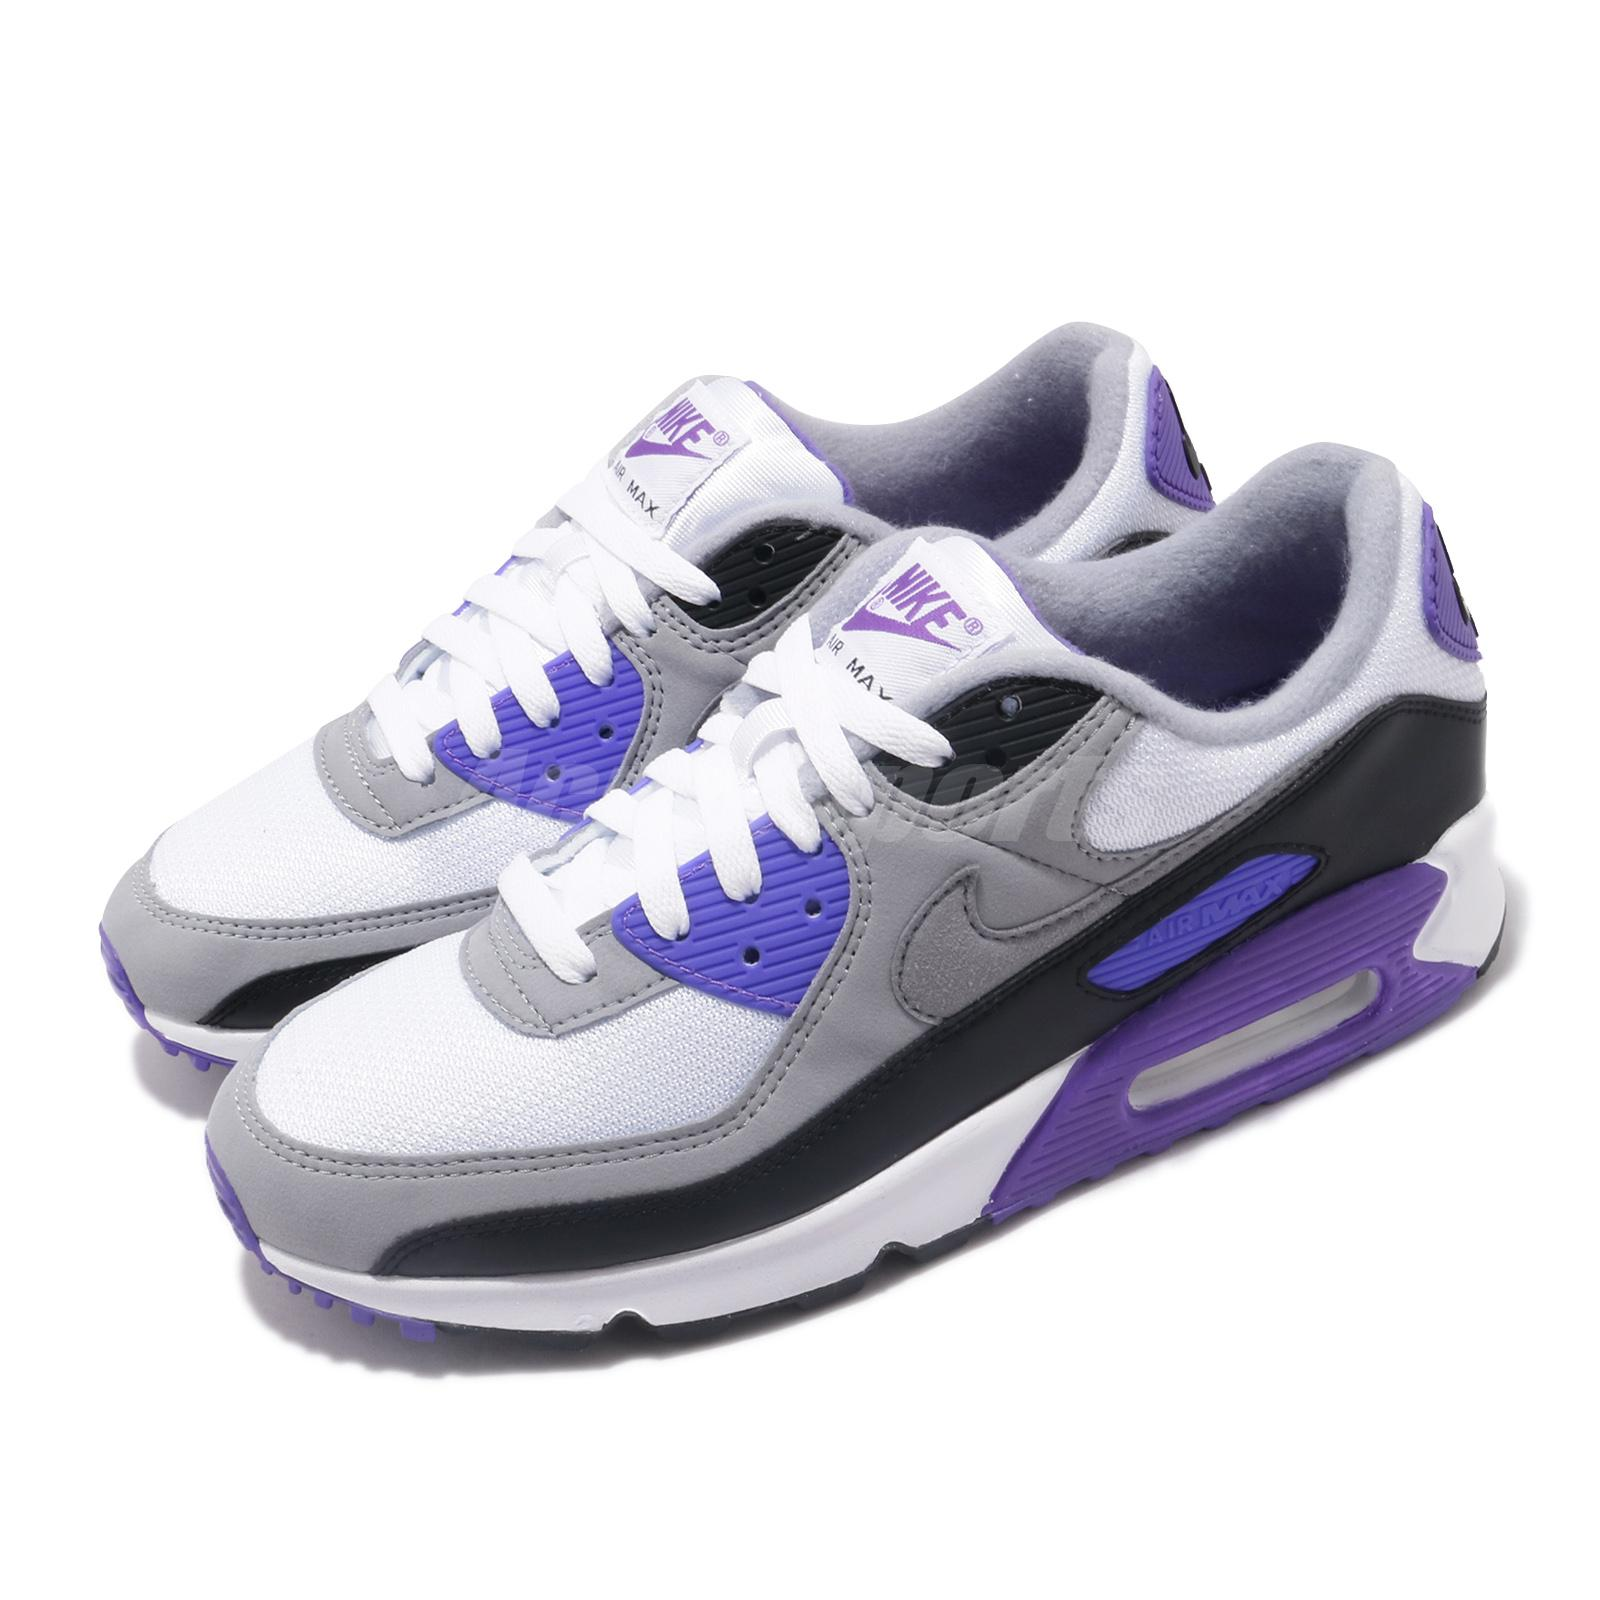 purple and gray nike air max